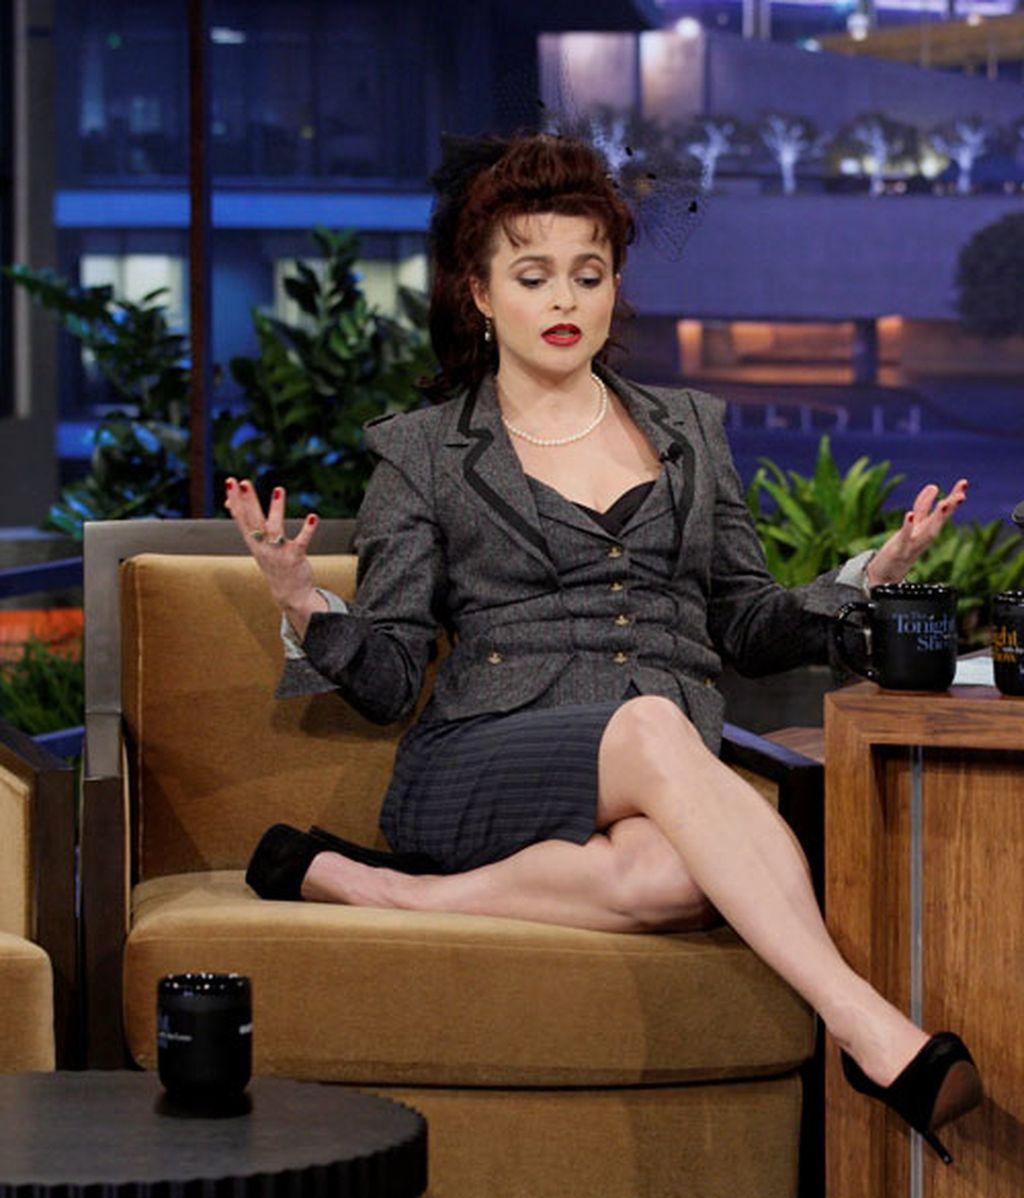 Helena Bonham Carter no decepciona: Oscar a la originalidad